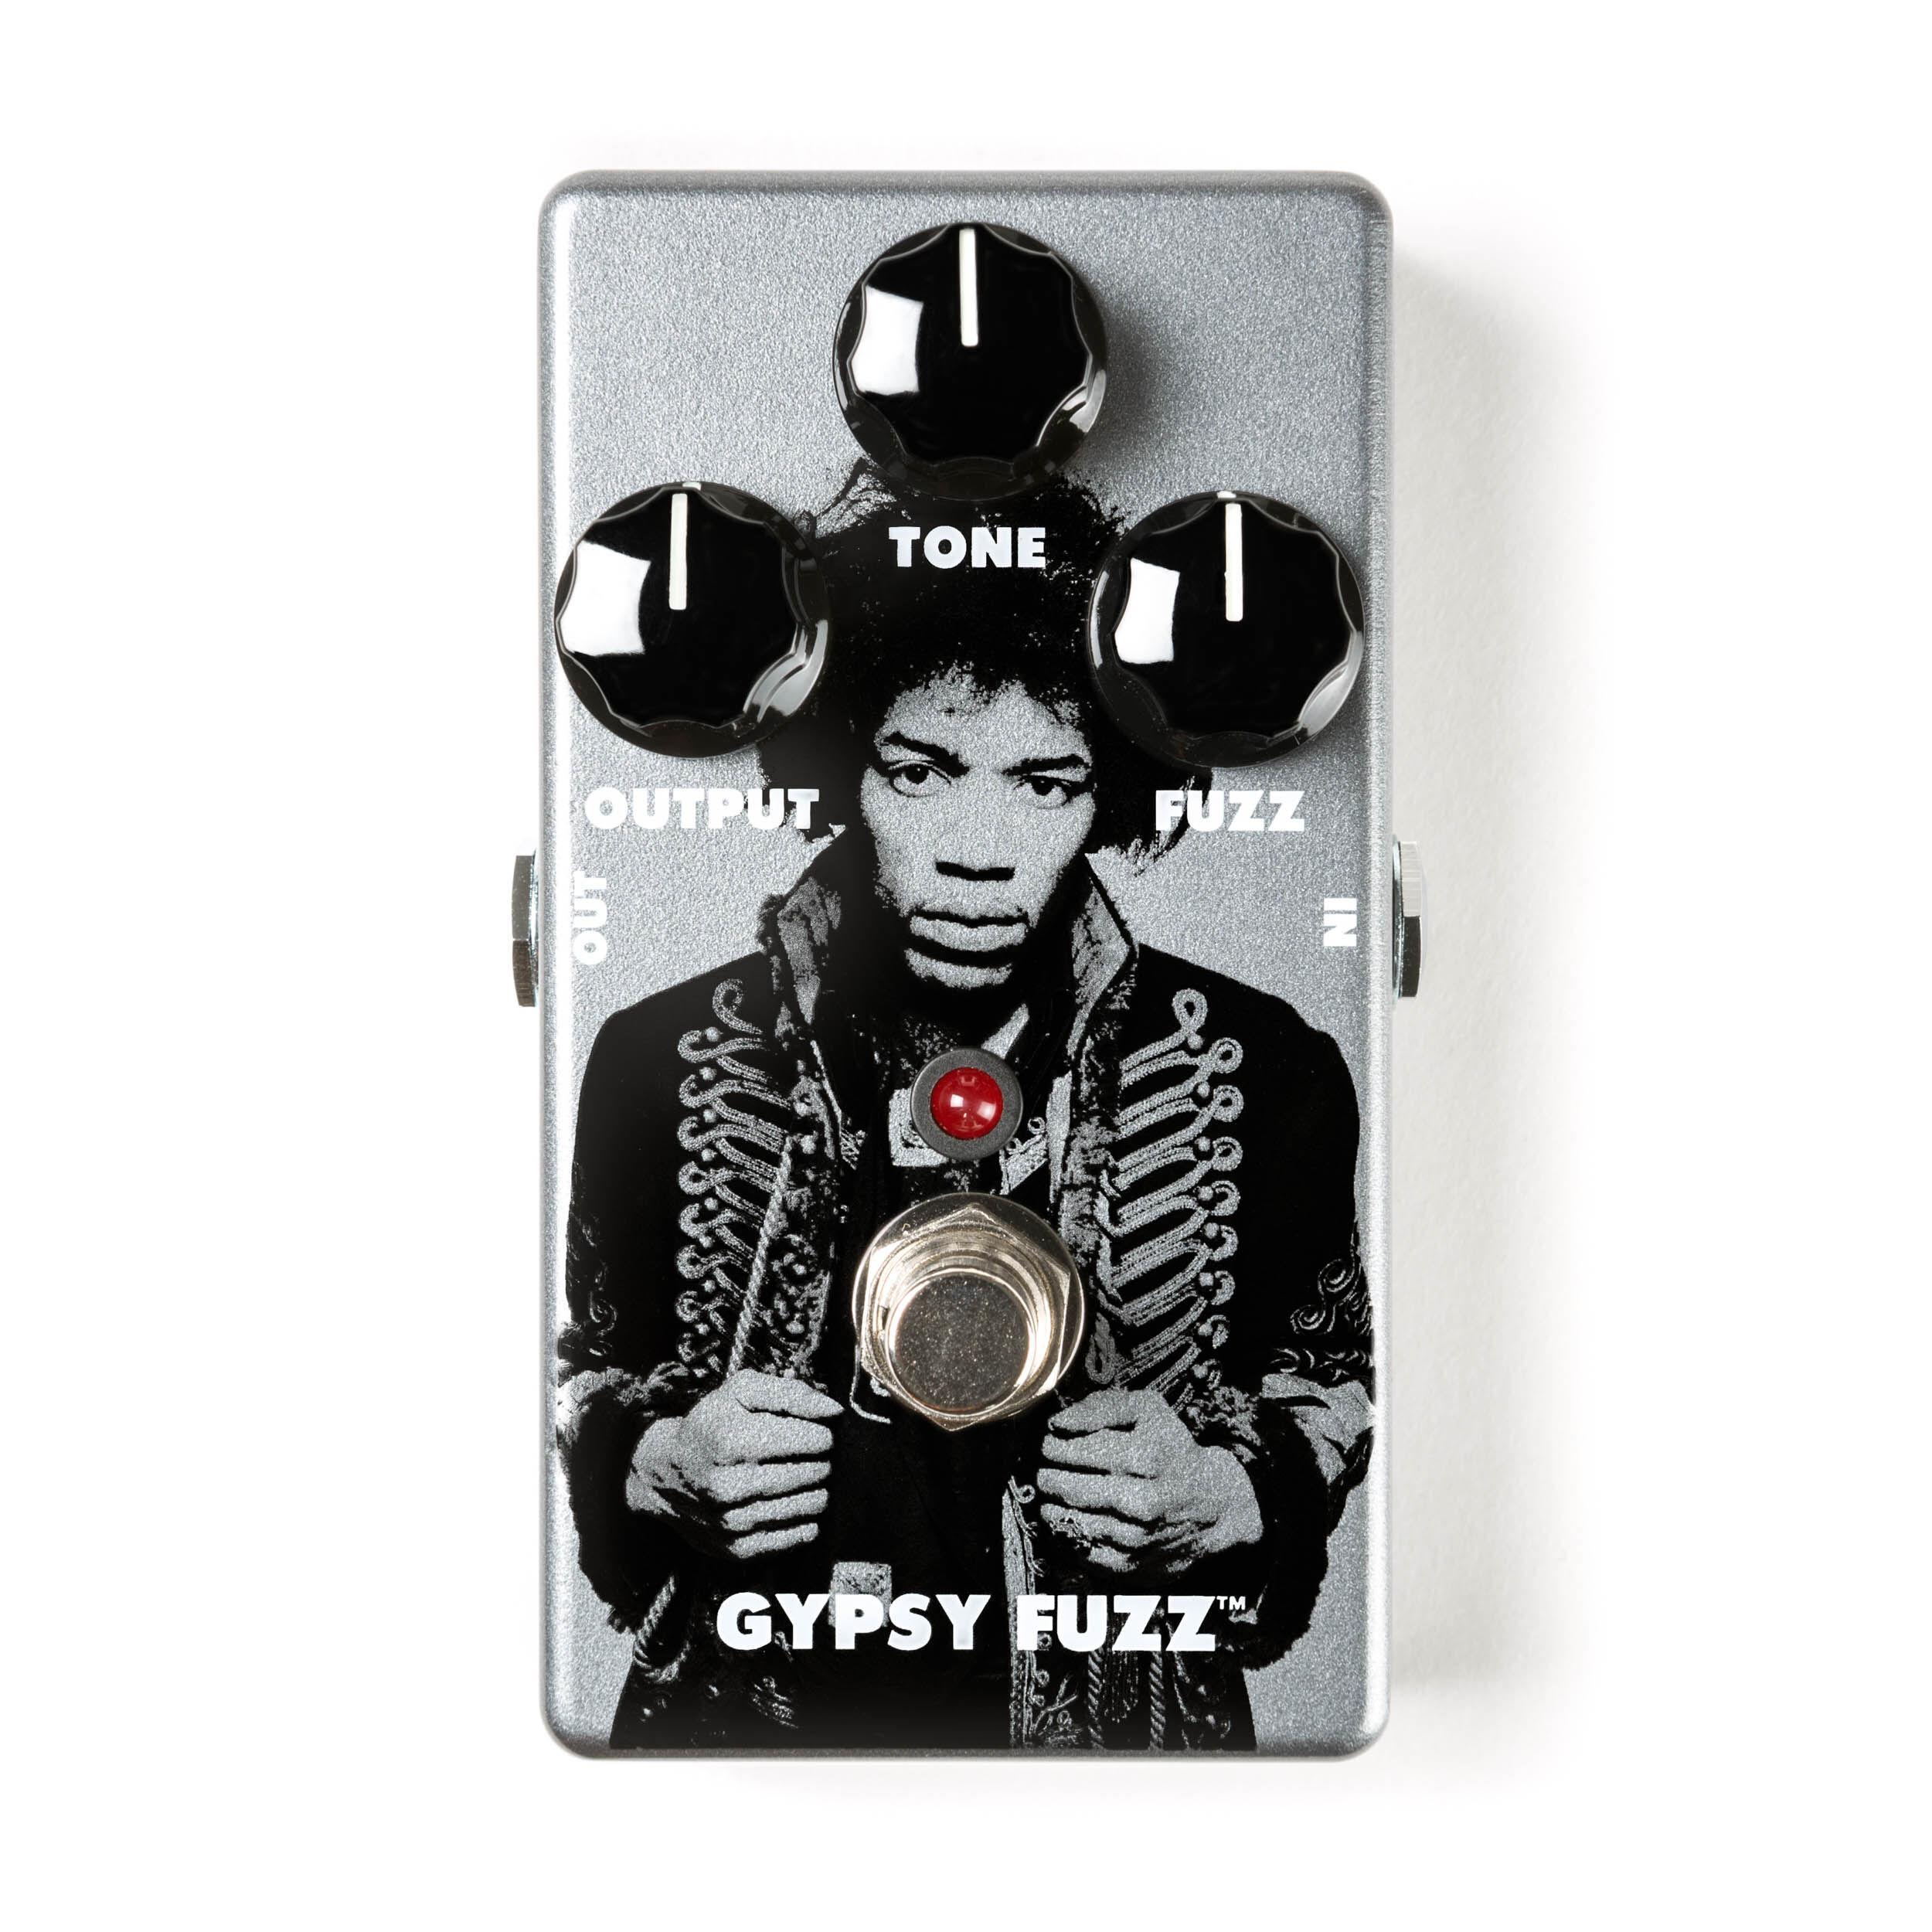 Mxr Jhm8 Jimi Hendrix Gypsy Fuzz Face - Limited Edition